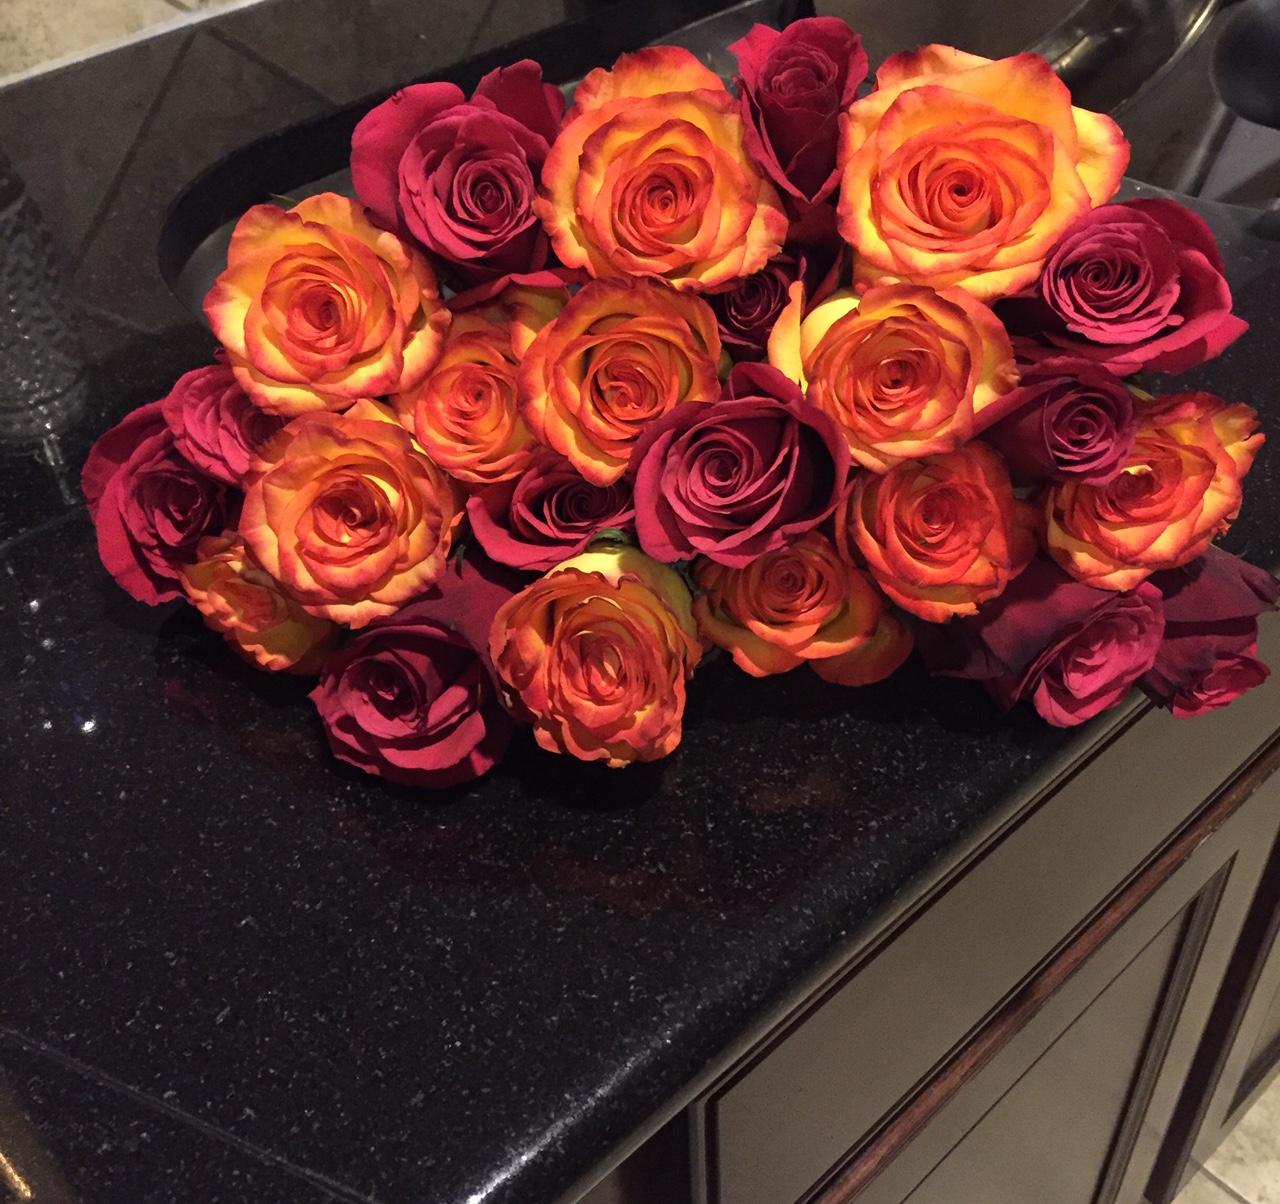 Supermarket flowers